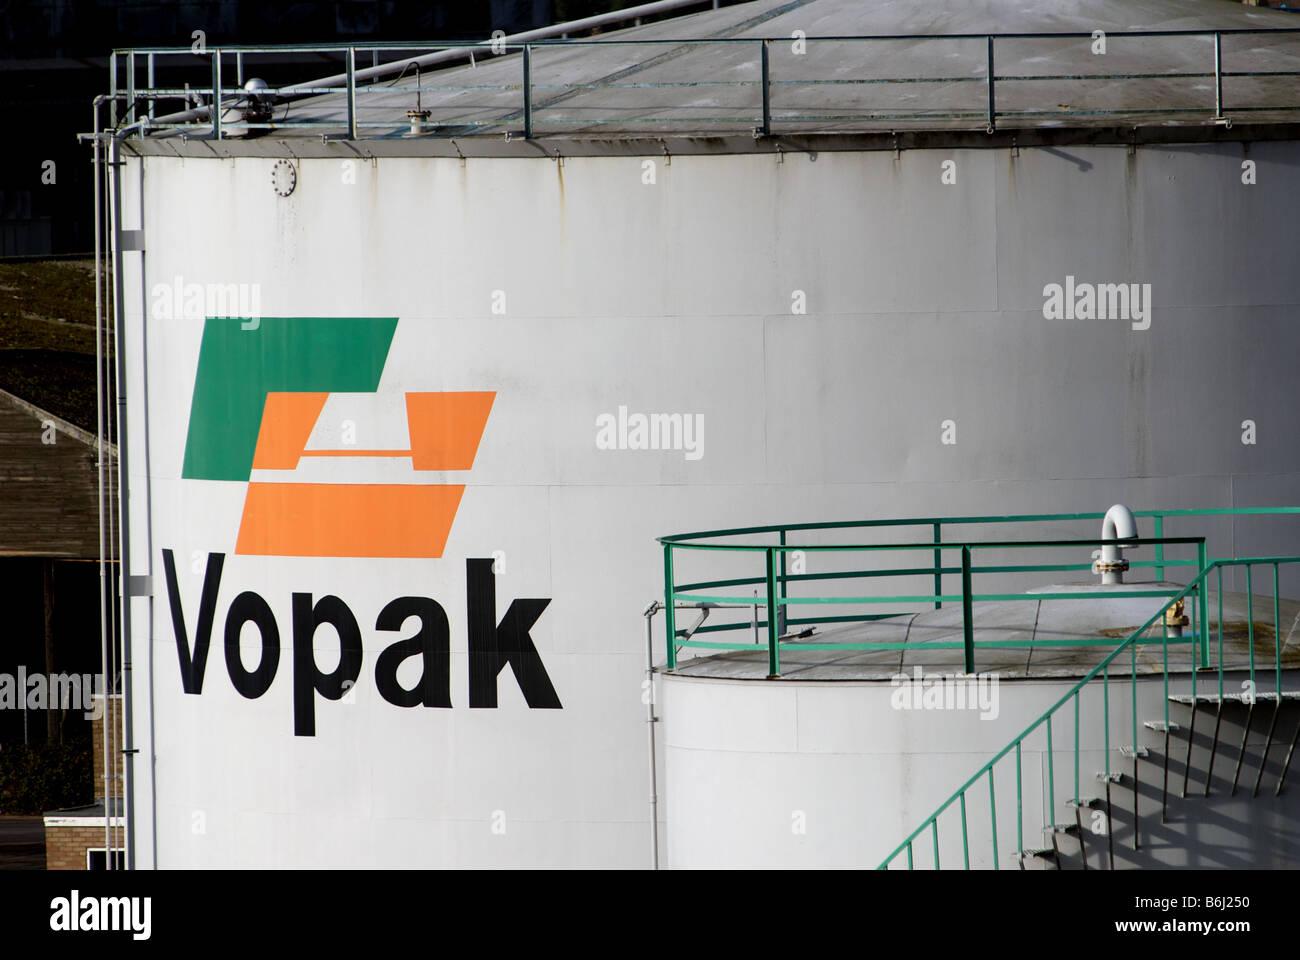 Petrochemical Storage Tanks Stock Photos & Petrochemical Storage ...